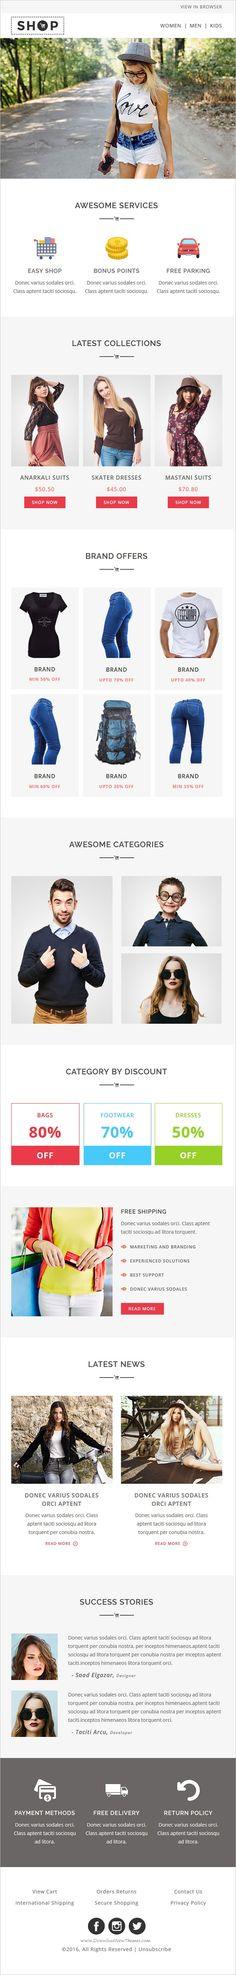 BEZIER - Modern Email Template + Online Access (Marketing, Email - marketing email template